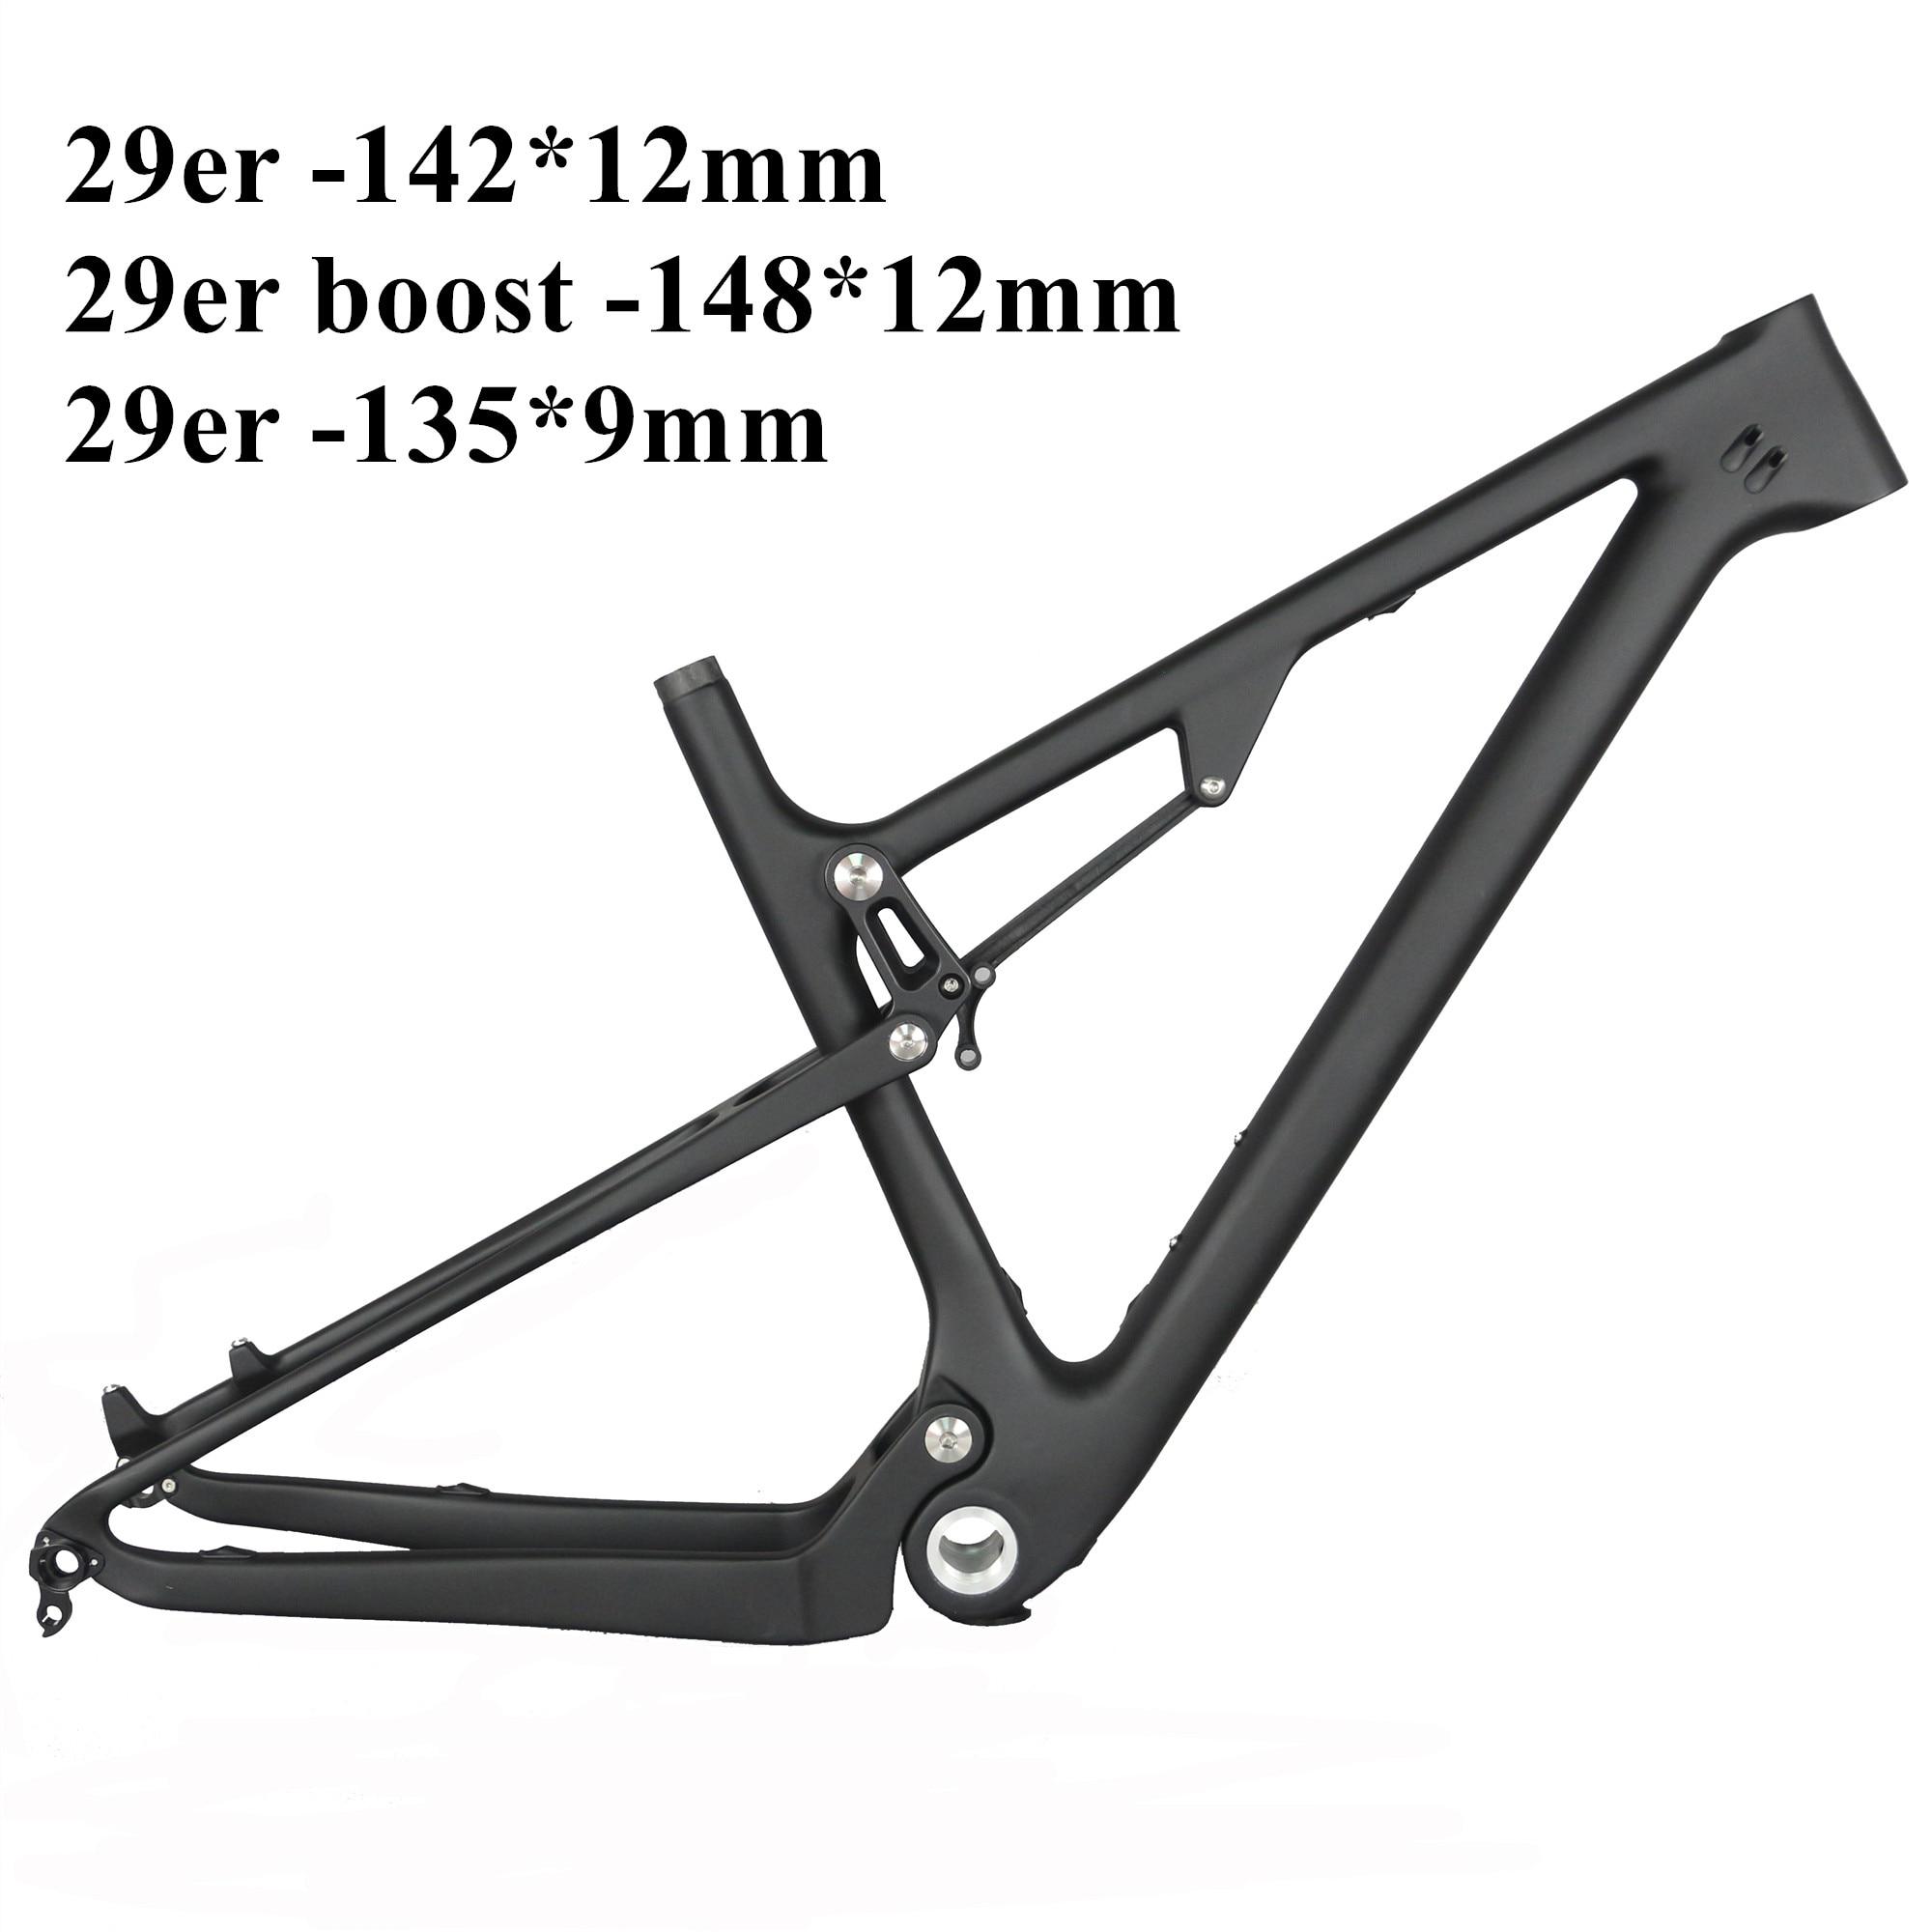 Free Shipping  Newest  29er*2.3tire Disc Brake Full Suspension Cross Country   Inner Cable Mountain Bike Frame FM037